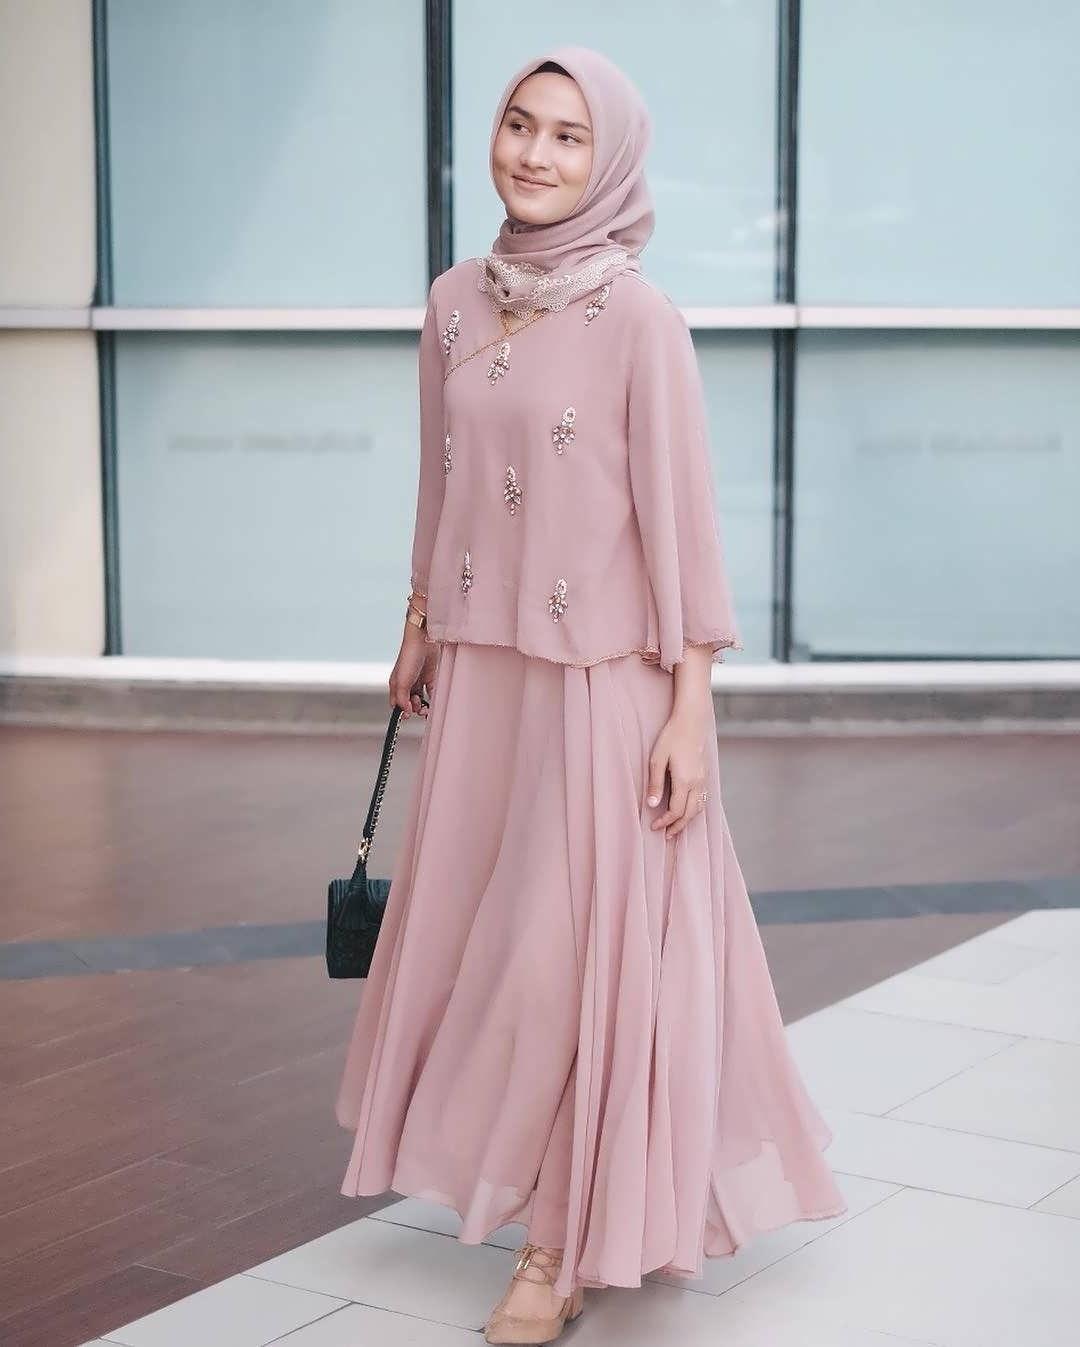 Bentuk Baju Lebaran Untuk Ibu Gemuk E6d5 35 Model Baju Gamis Terbaru Lebaran Hamil Gemuk Kurus